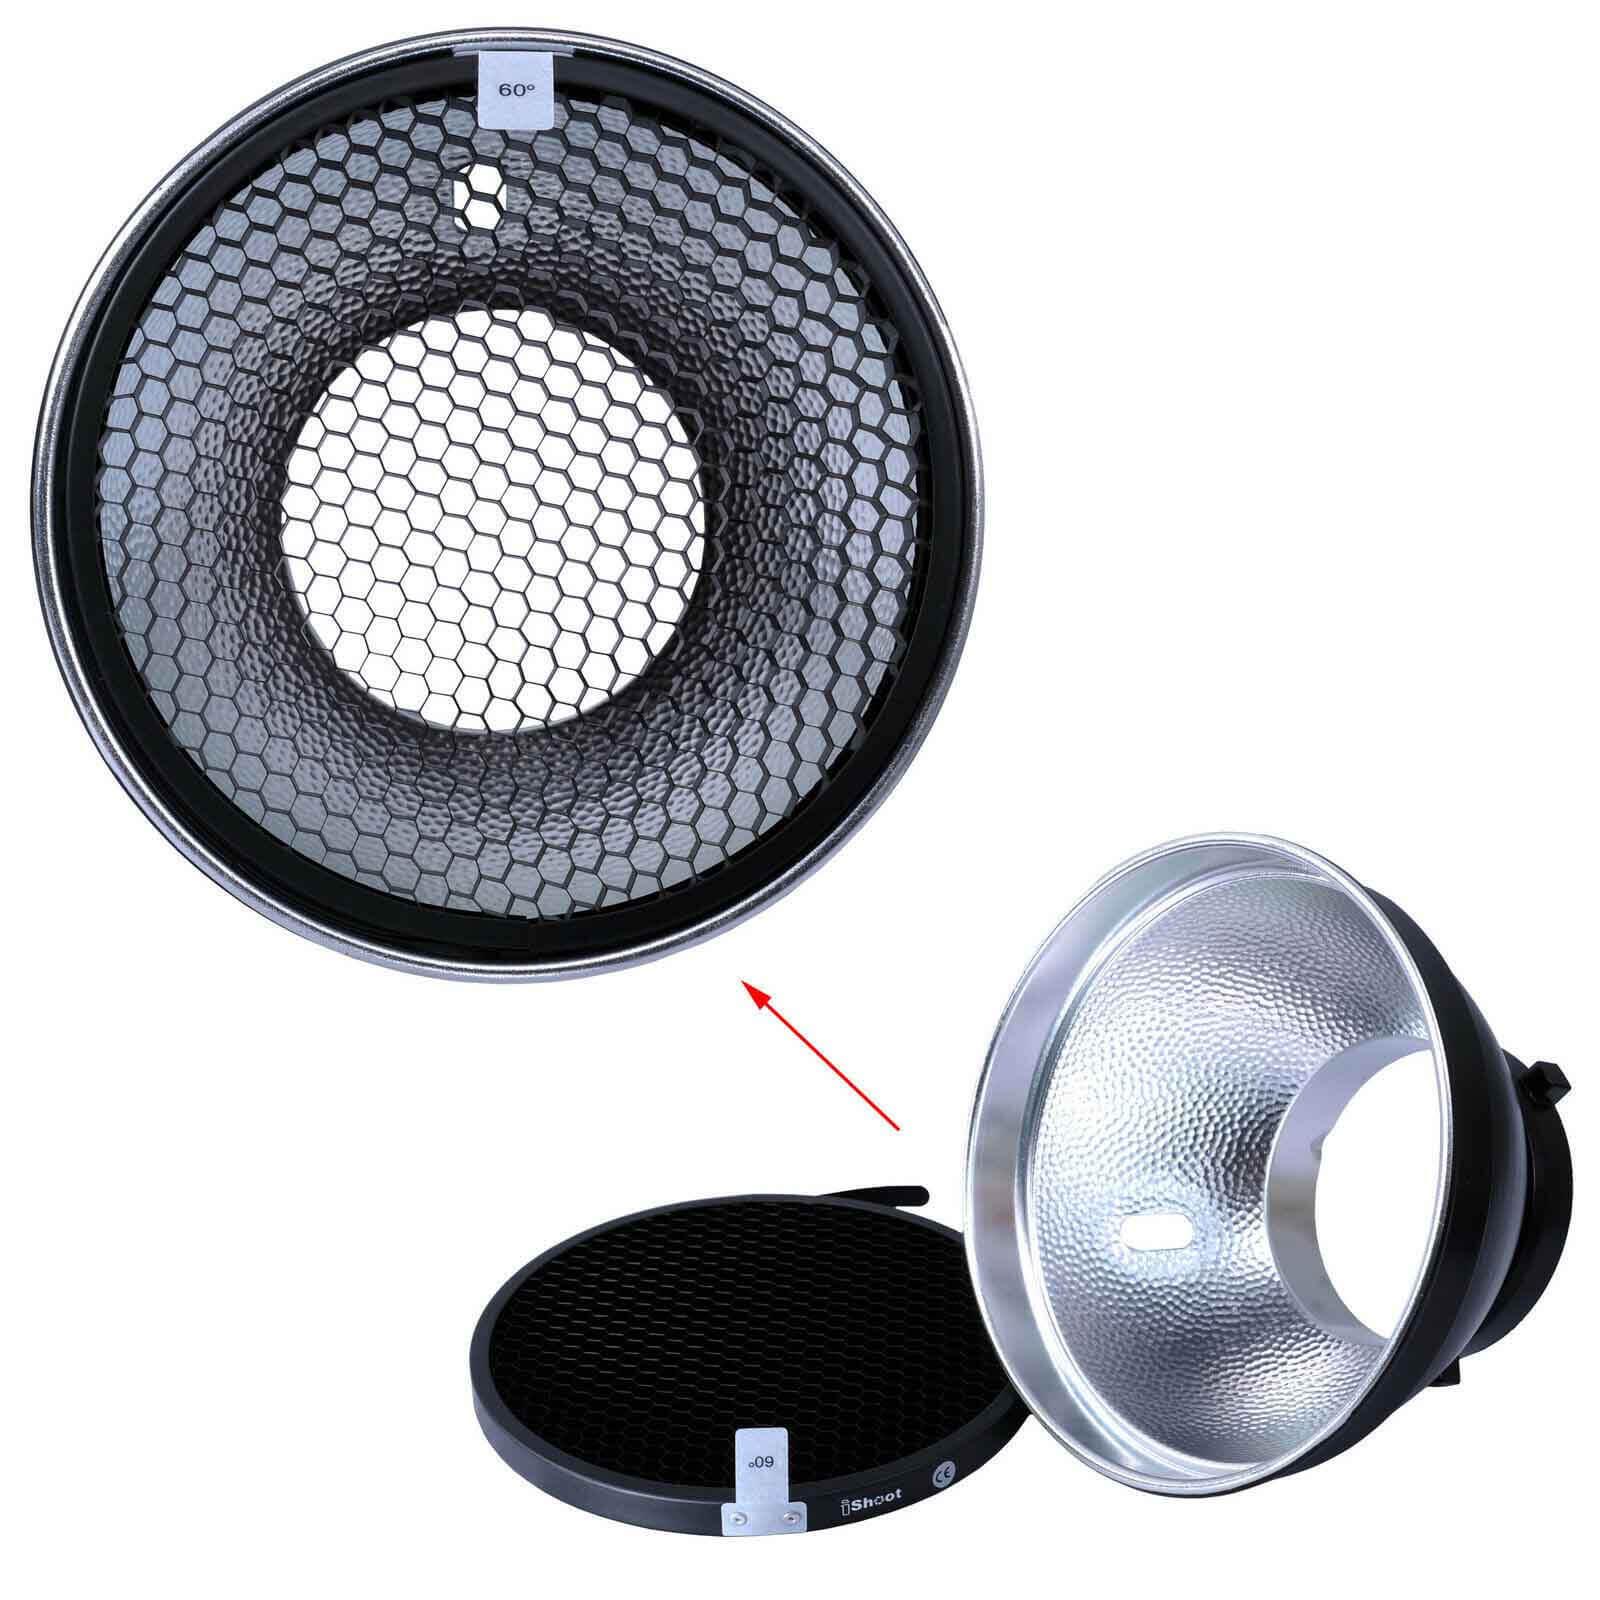 18cm Reflector Diffuser+Honeycomb Grid for Bowens Mount Studio Strobe Flash